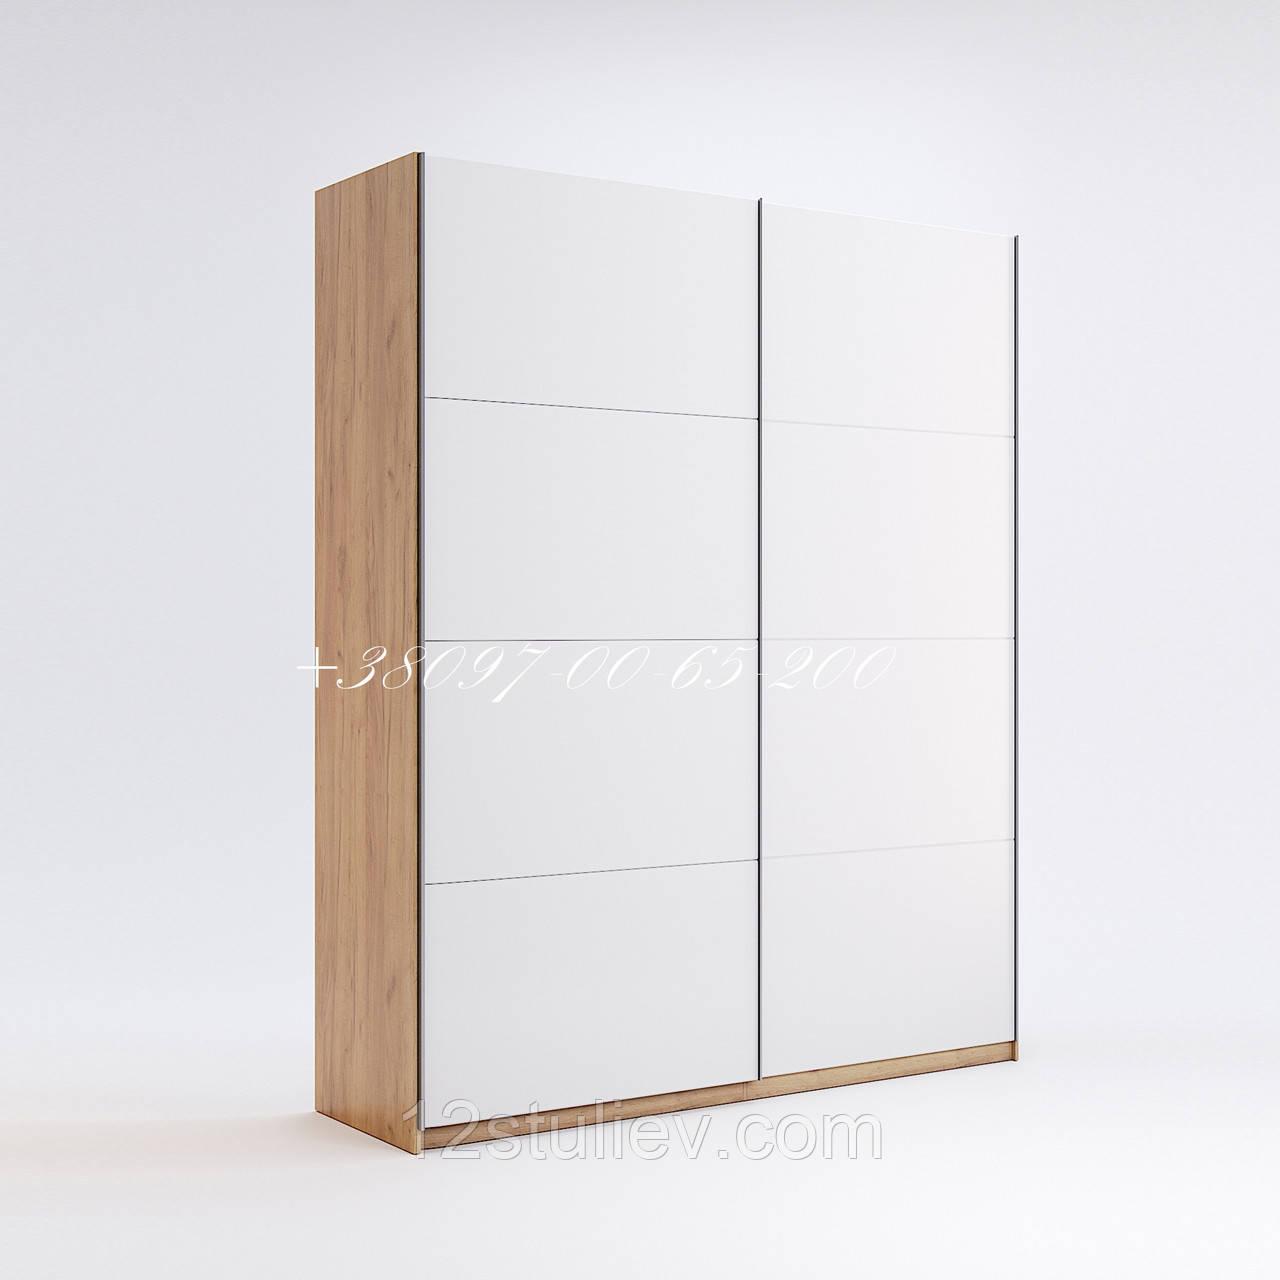 Шафа-КУПЕ Асті 2,5 м (*Двері білий глянець*)